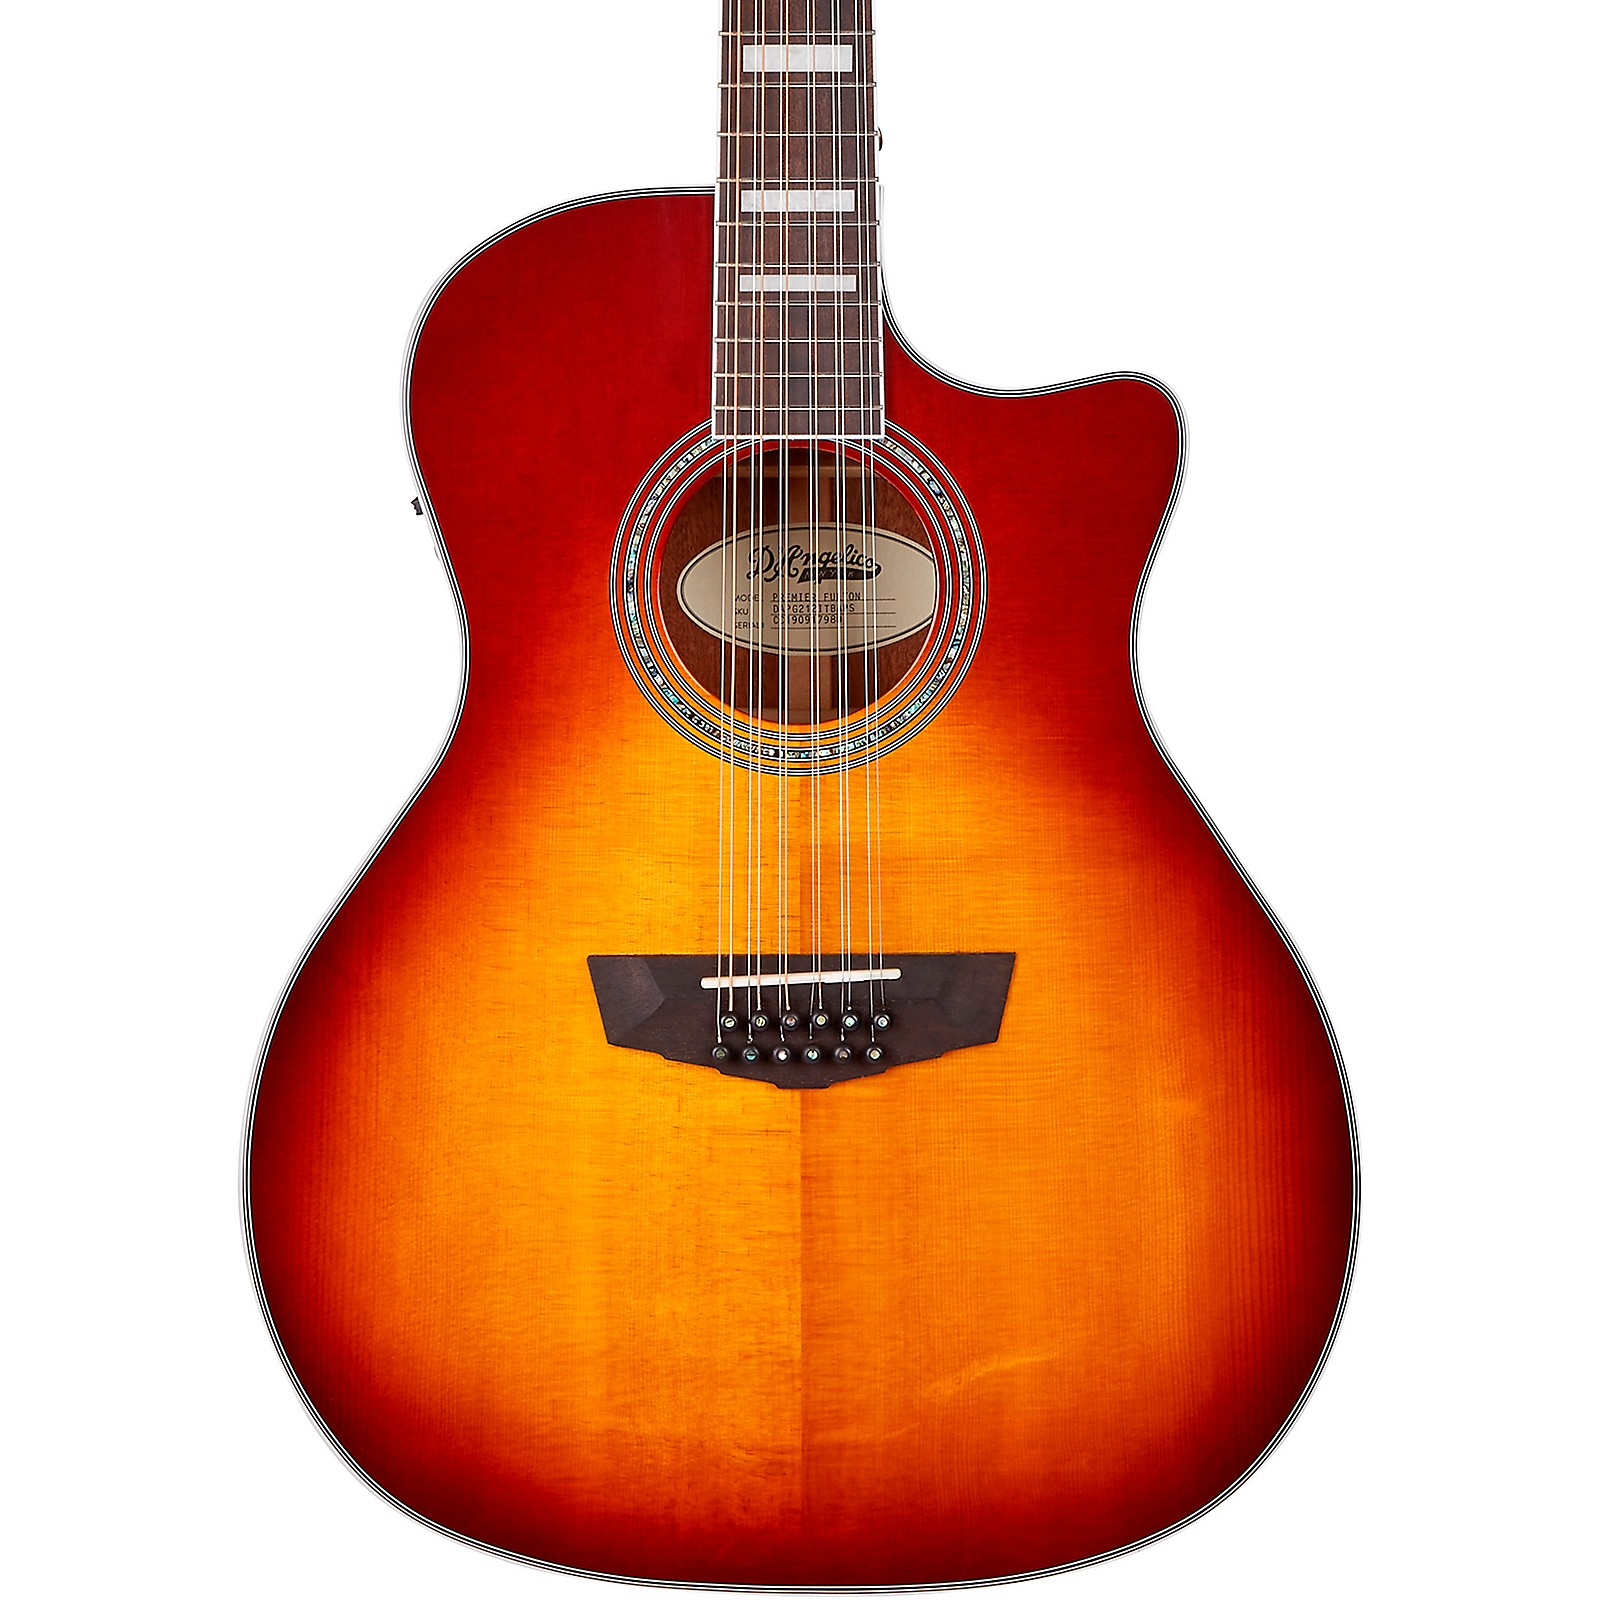 D'Angelico Premier Series Fulton Cutaway Grand Auditorium 12-string Acoustic-Electric Guitar